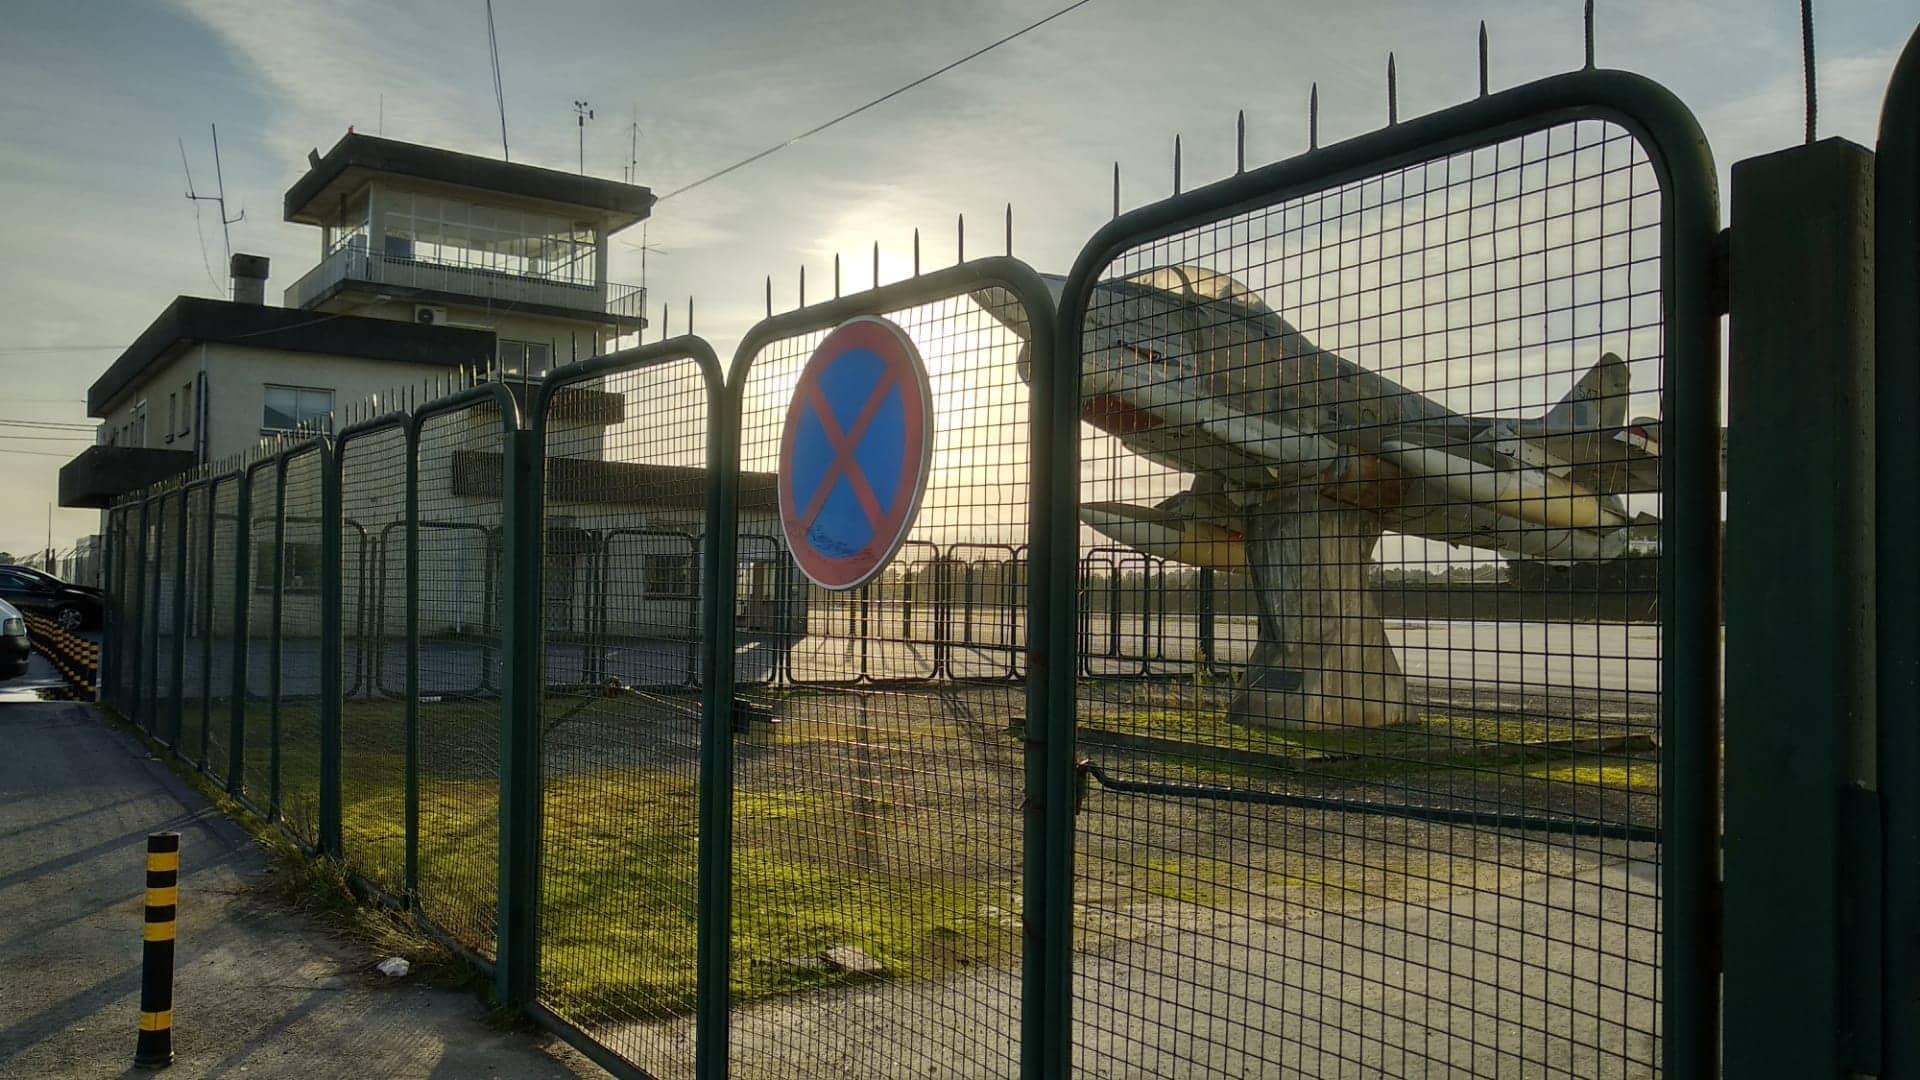 Aeródromo de Vila Real continua encerrado